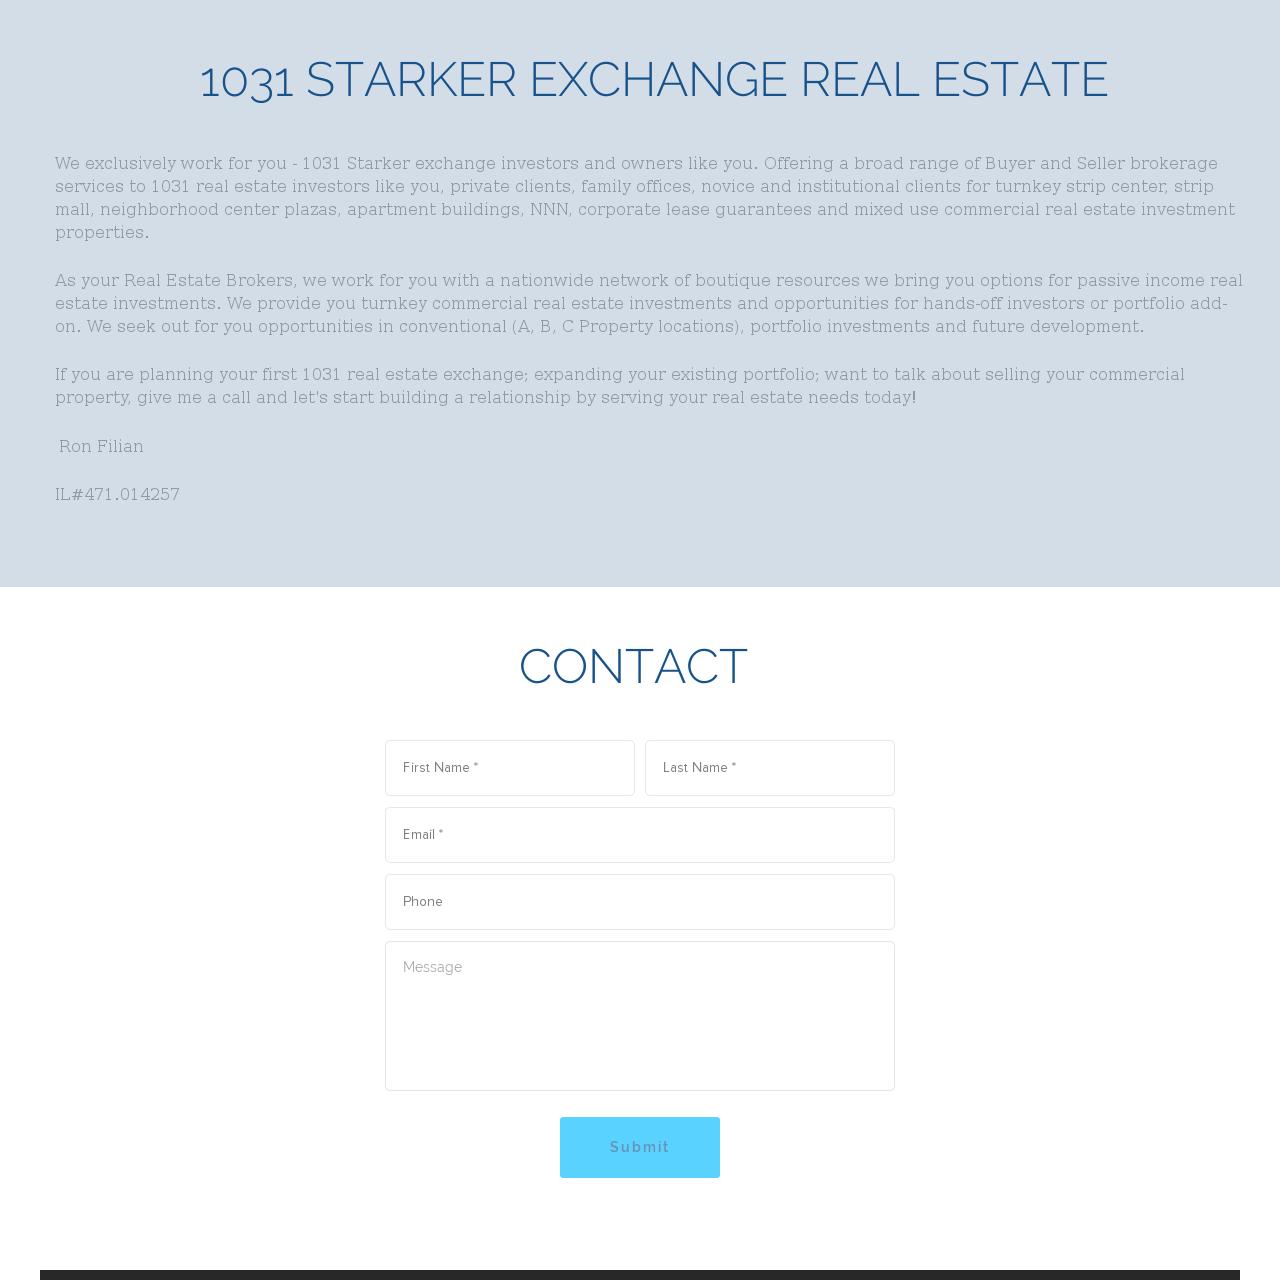 1031 Starker Real Estate Exchange, 1031 Chicago commercial